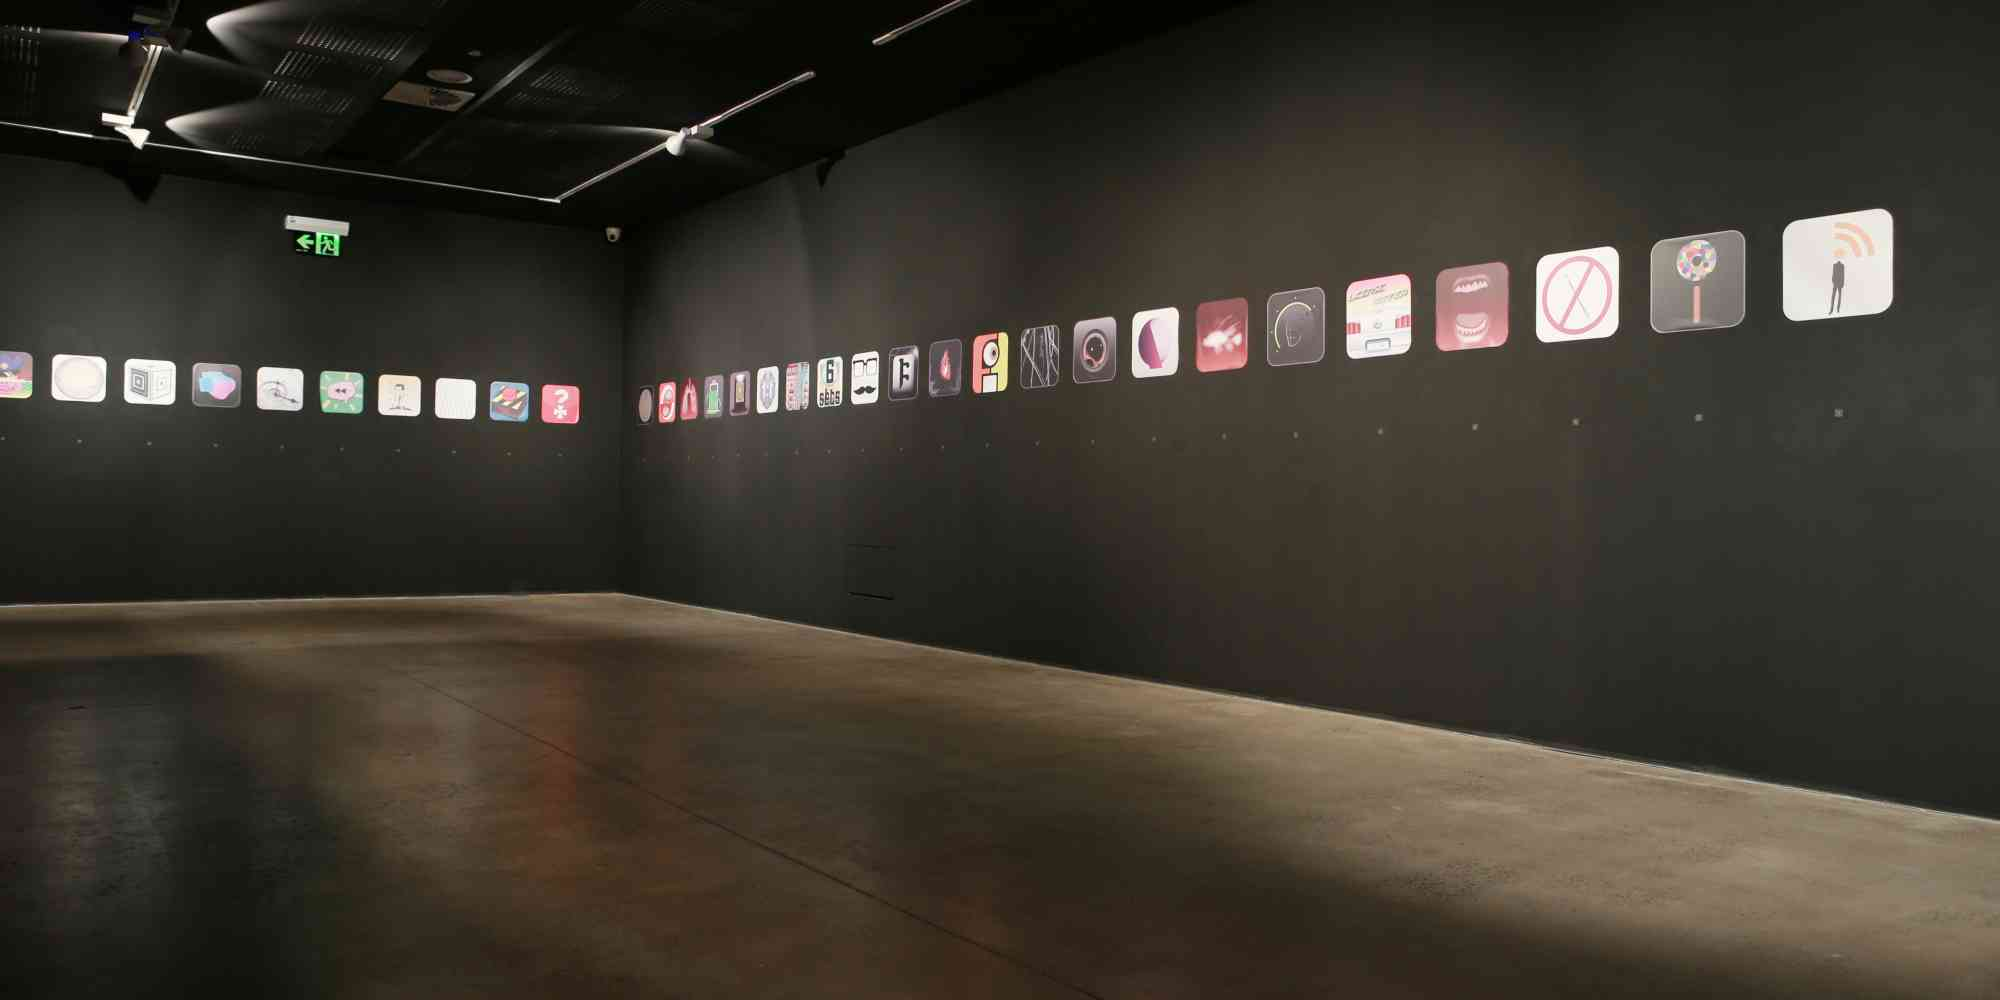 Artist-in-Residence: UNSW Art & Design